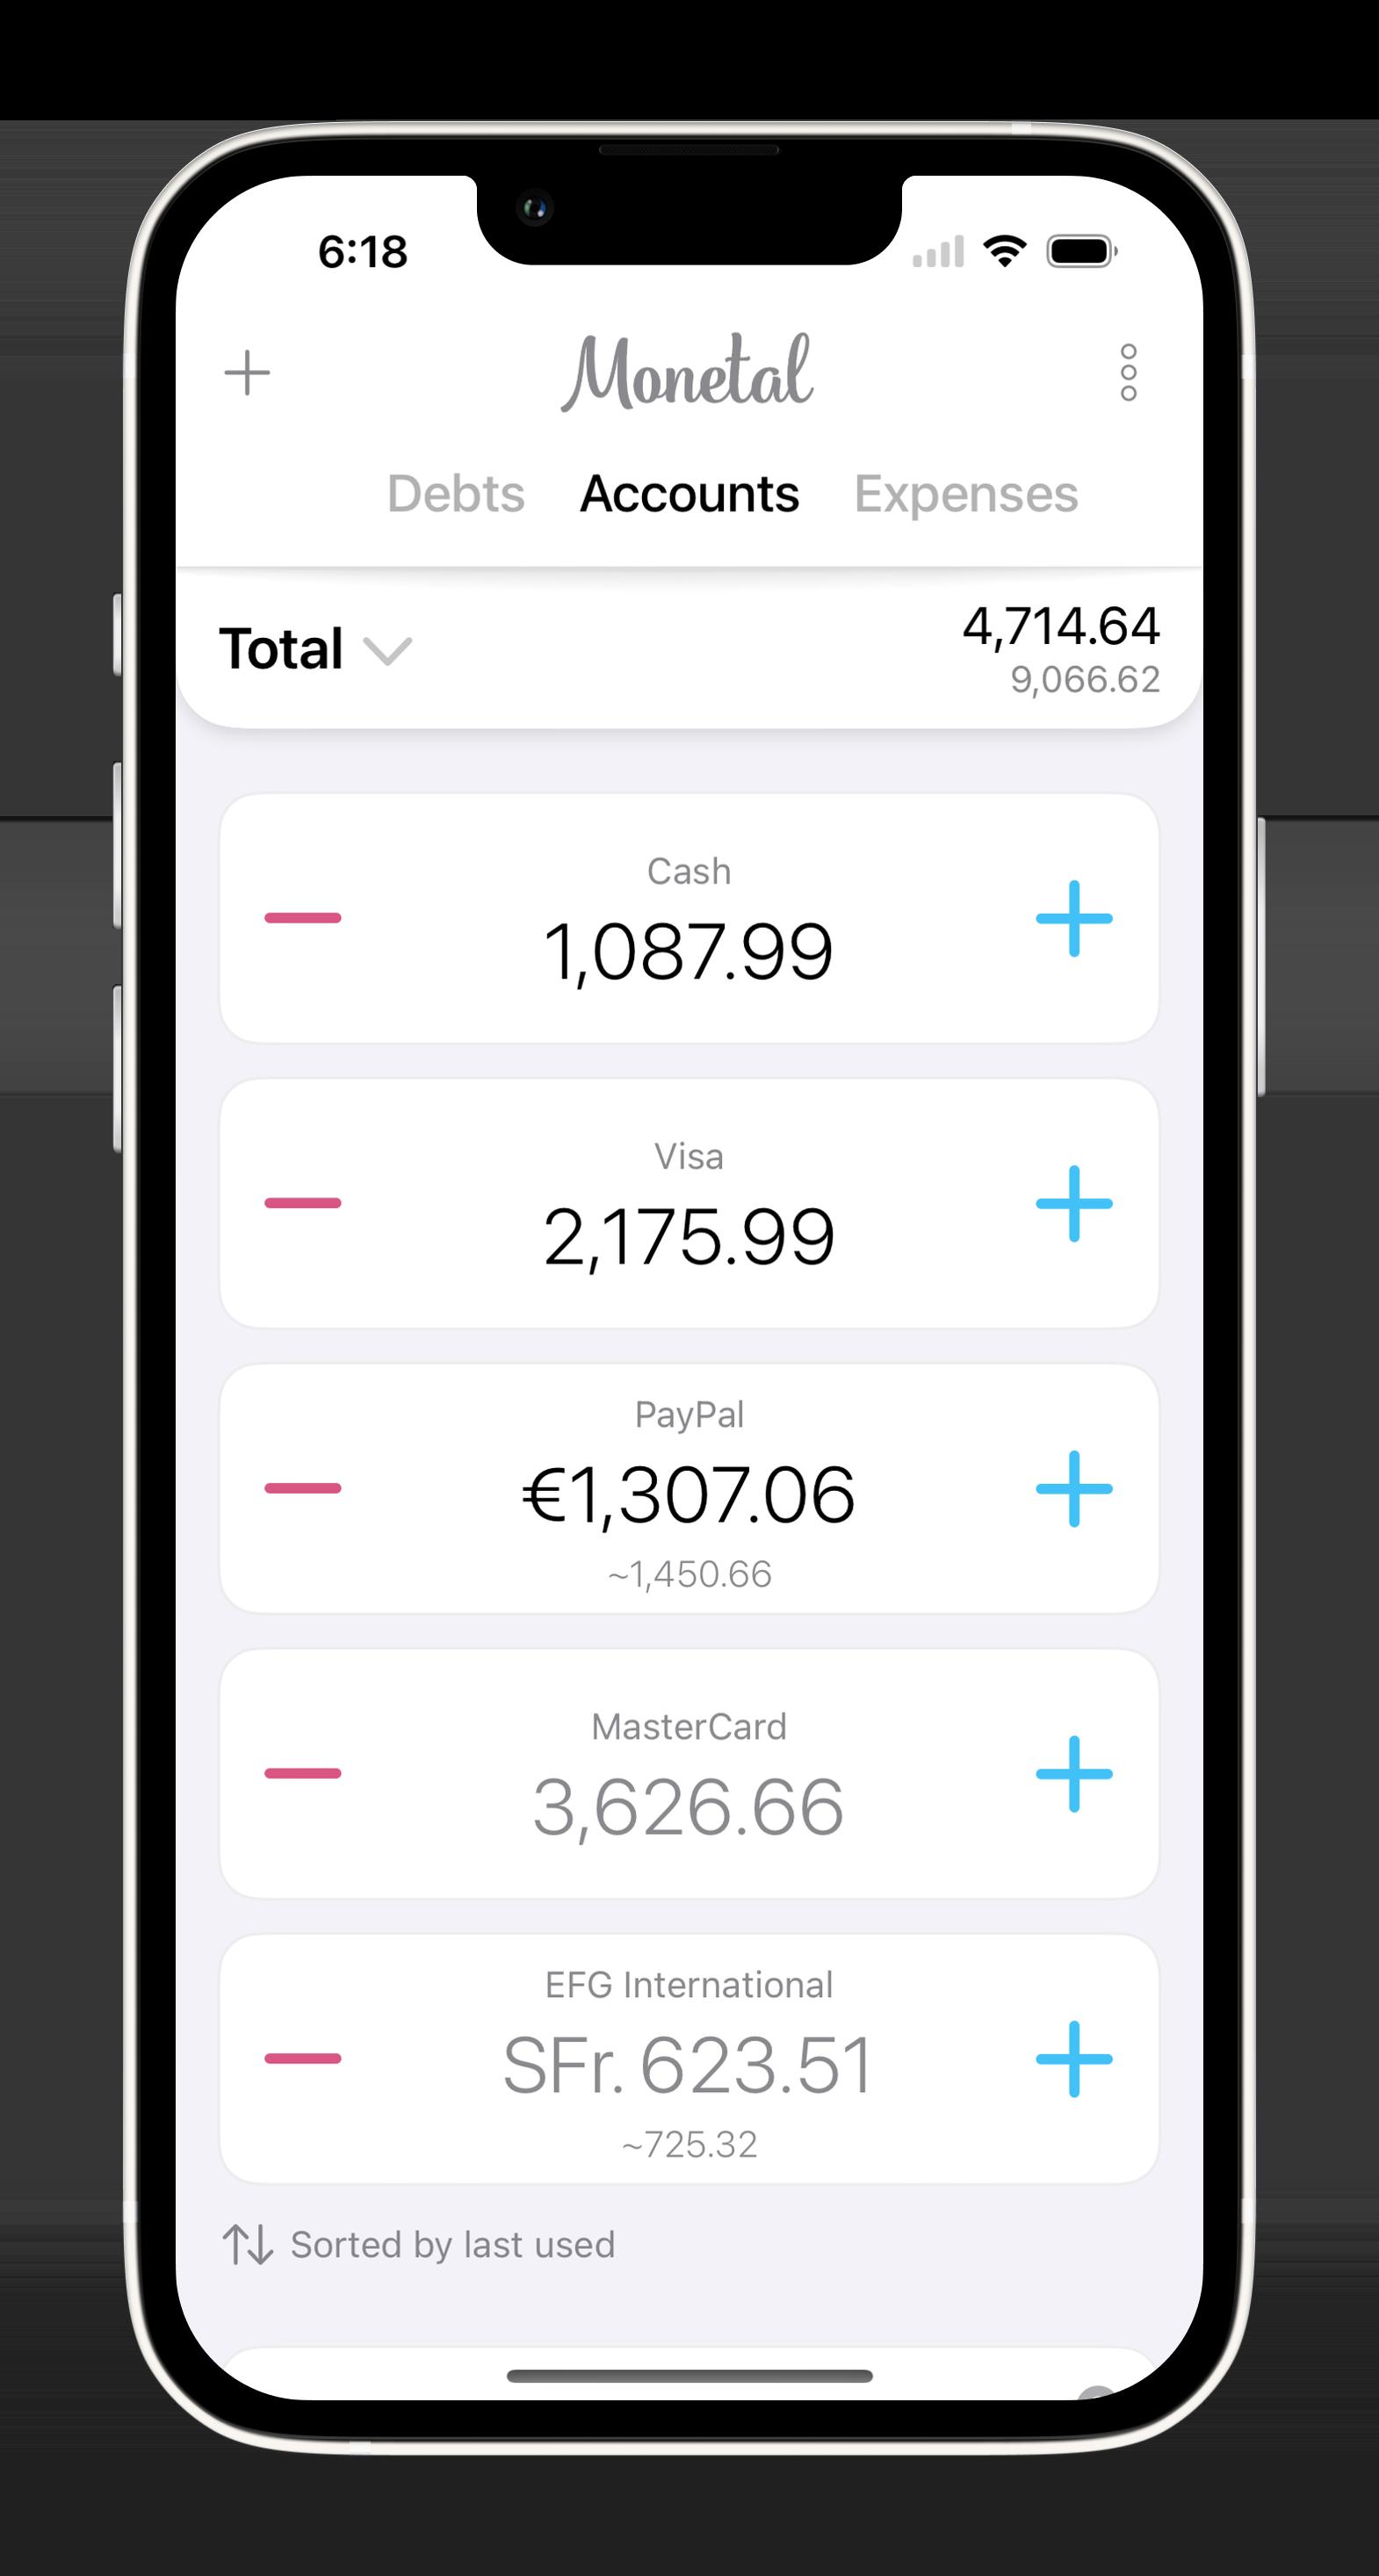 Monetal - expense tracker